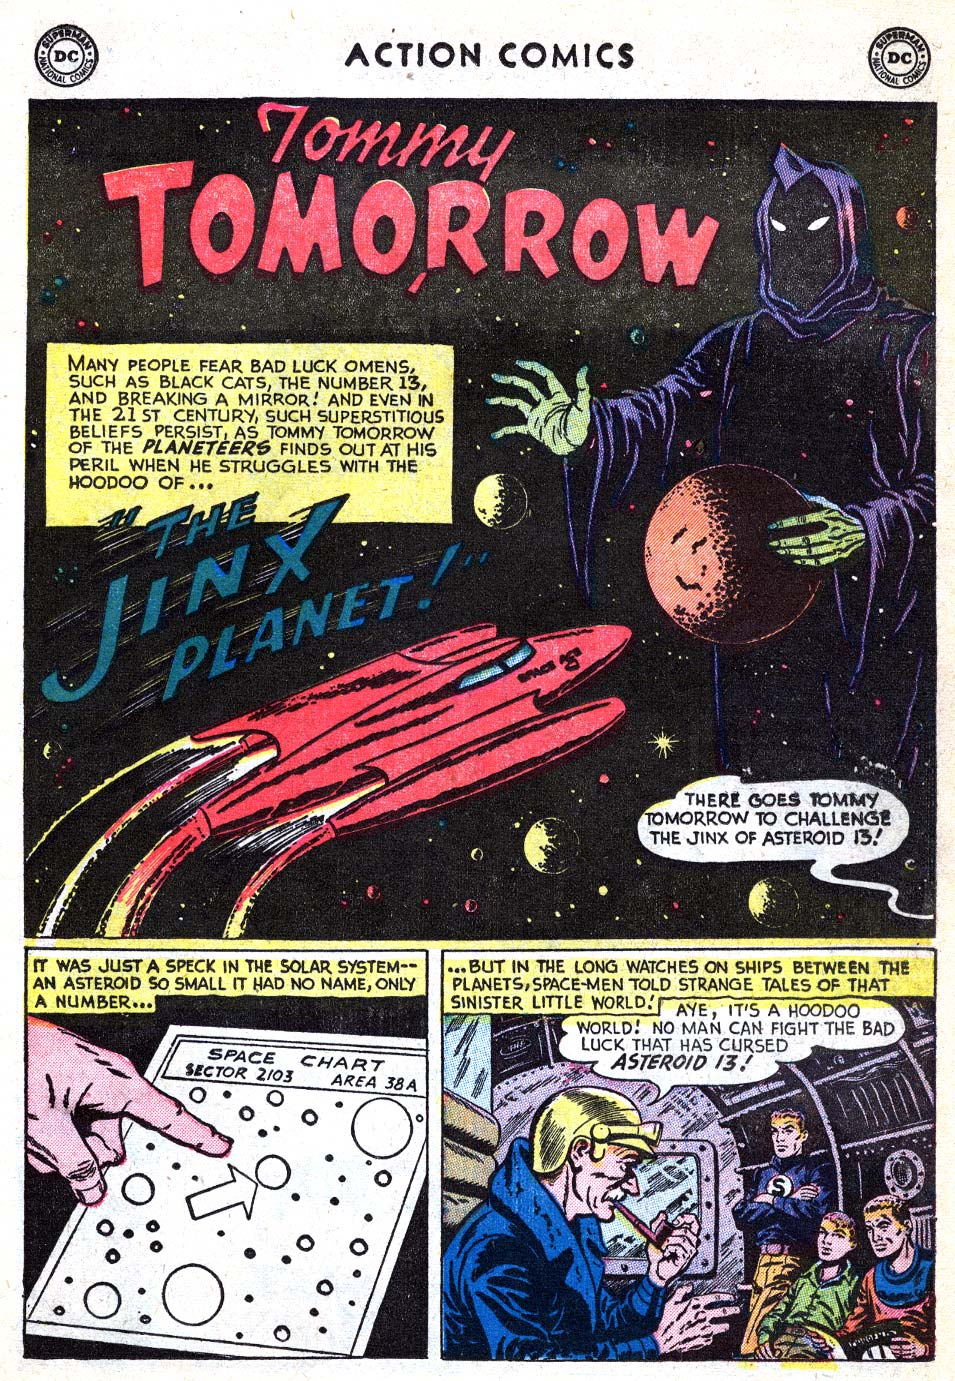 Action Comics (1938) 182 Page 24